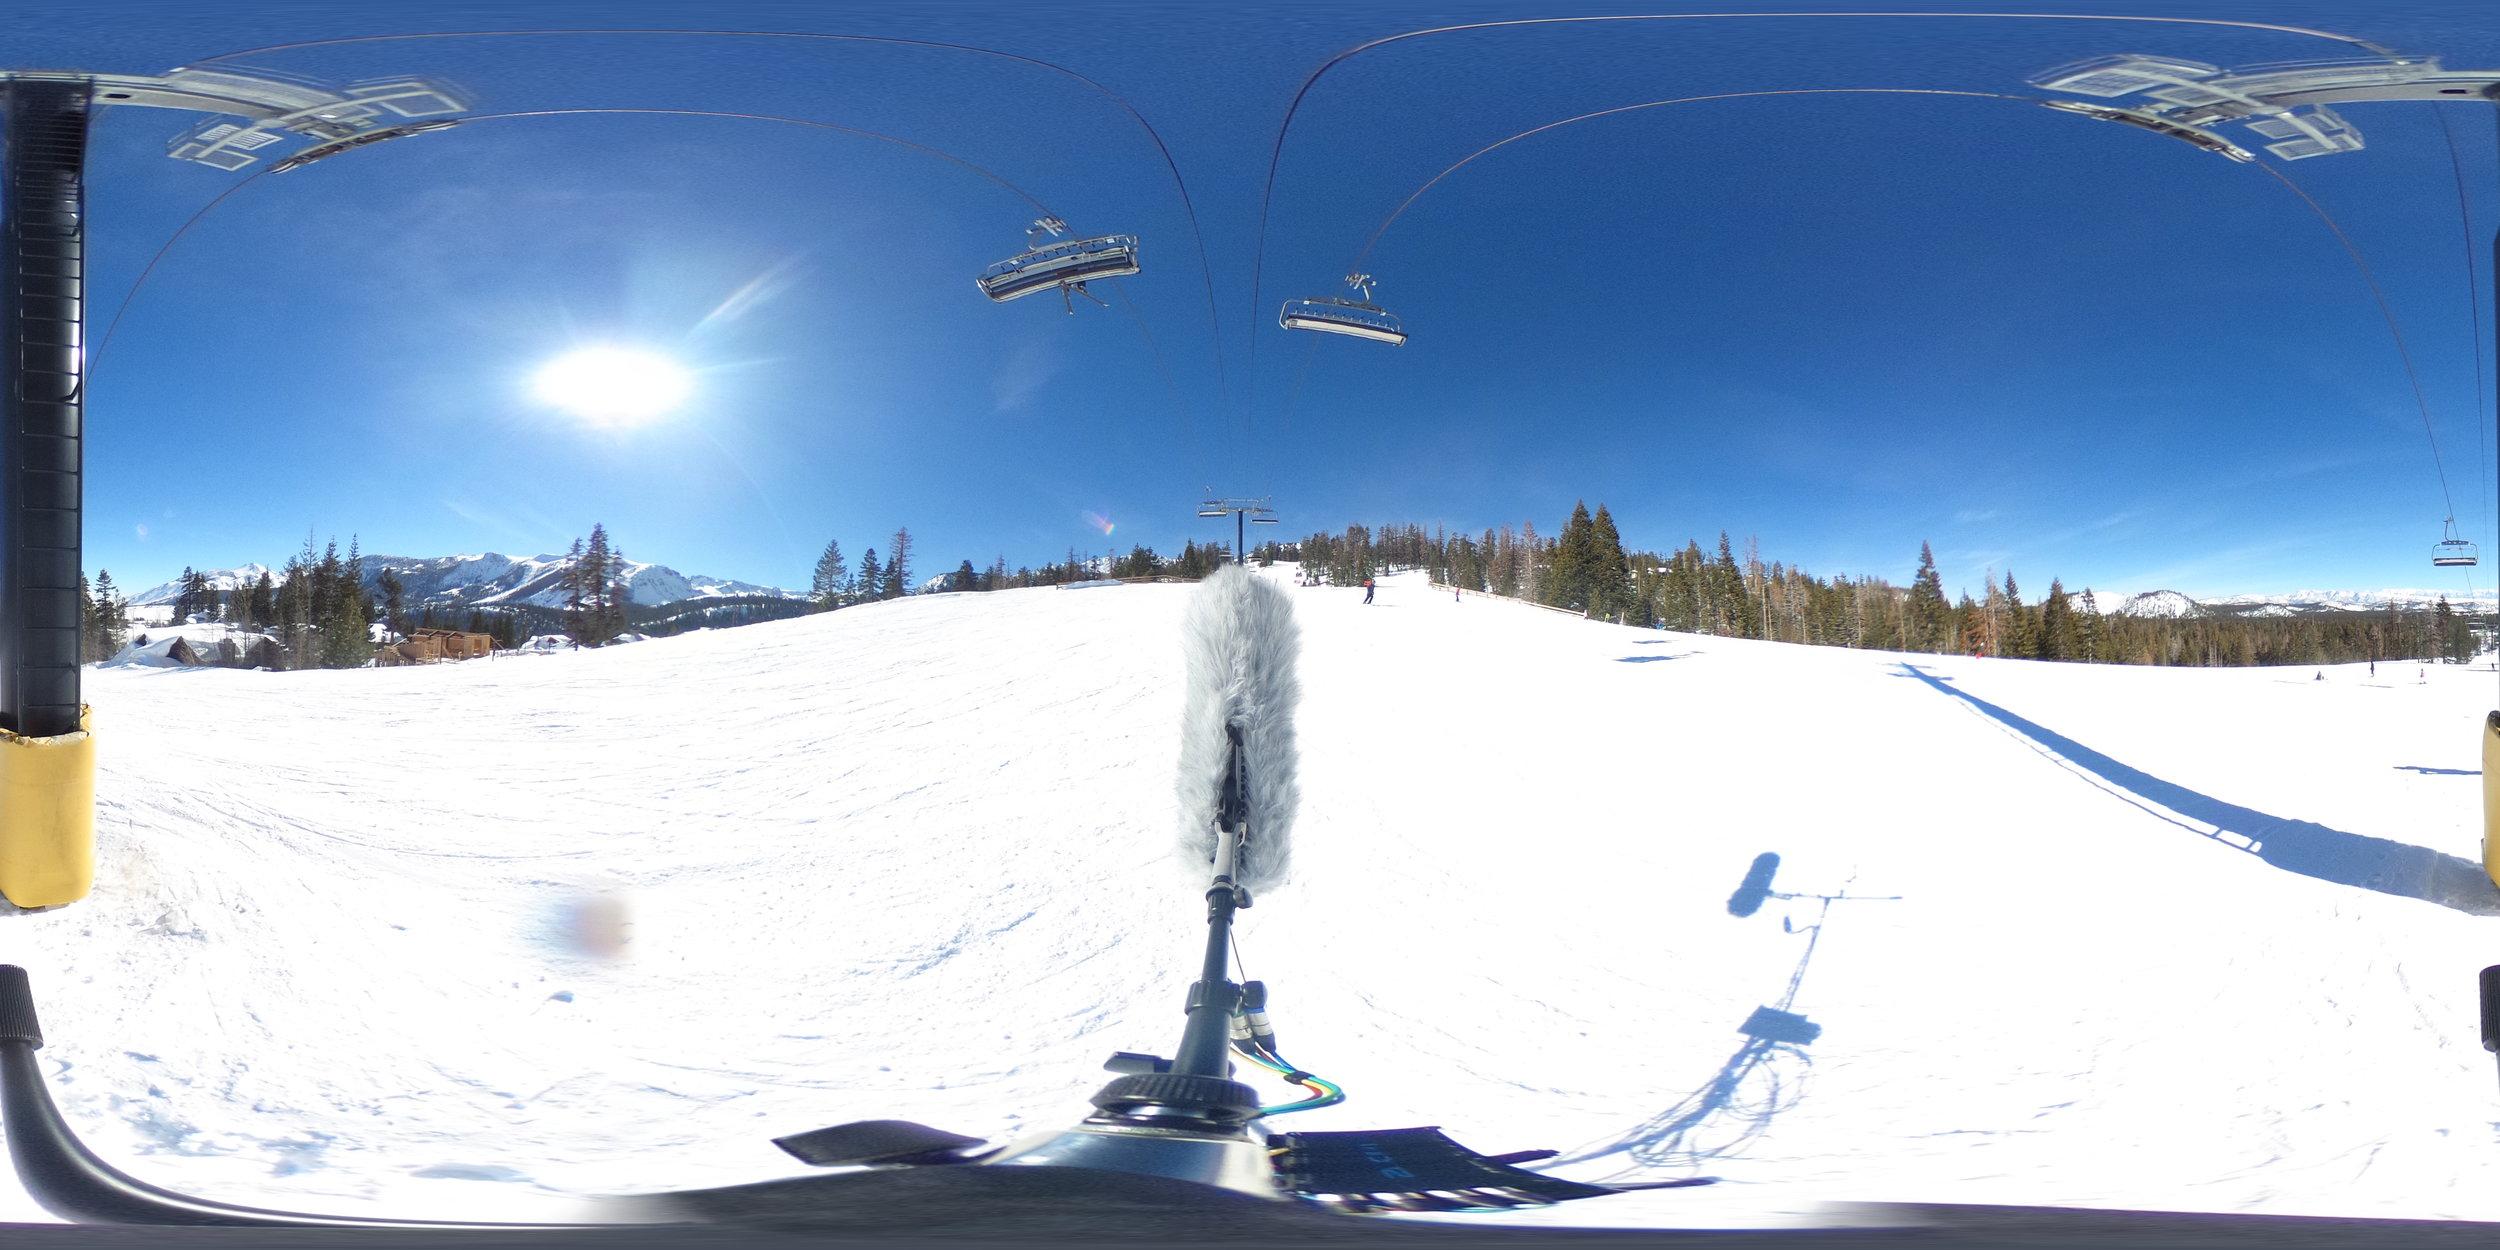 EXT_Day_SkiSlope_SkiLiftOverhead_SkiBys_SnowboardBys_VariousVoices_JPEG.JPG